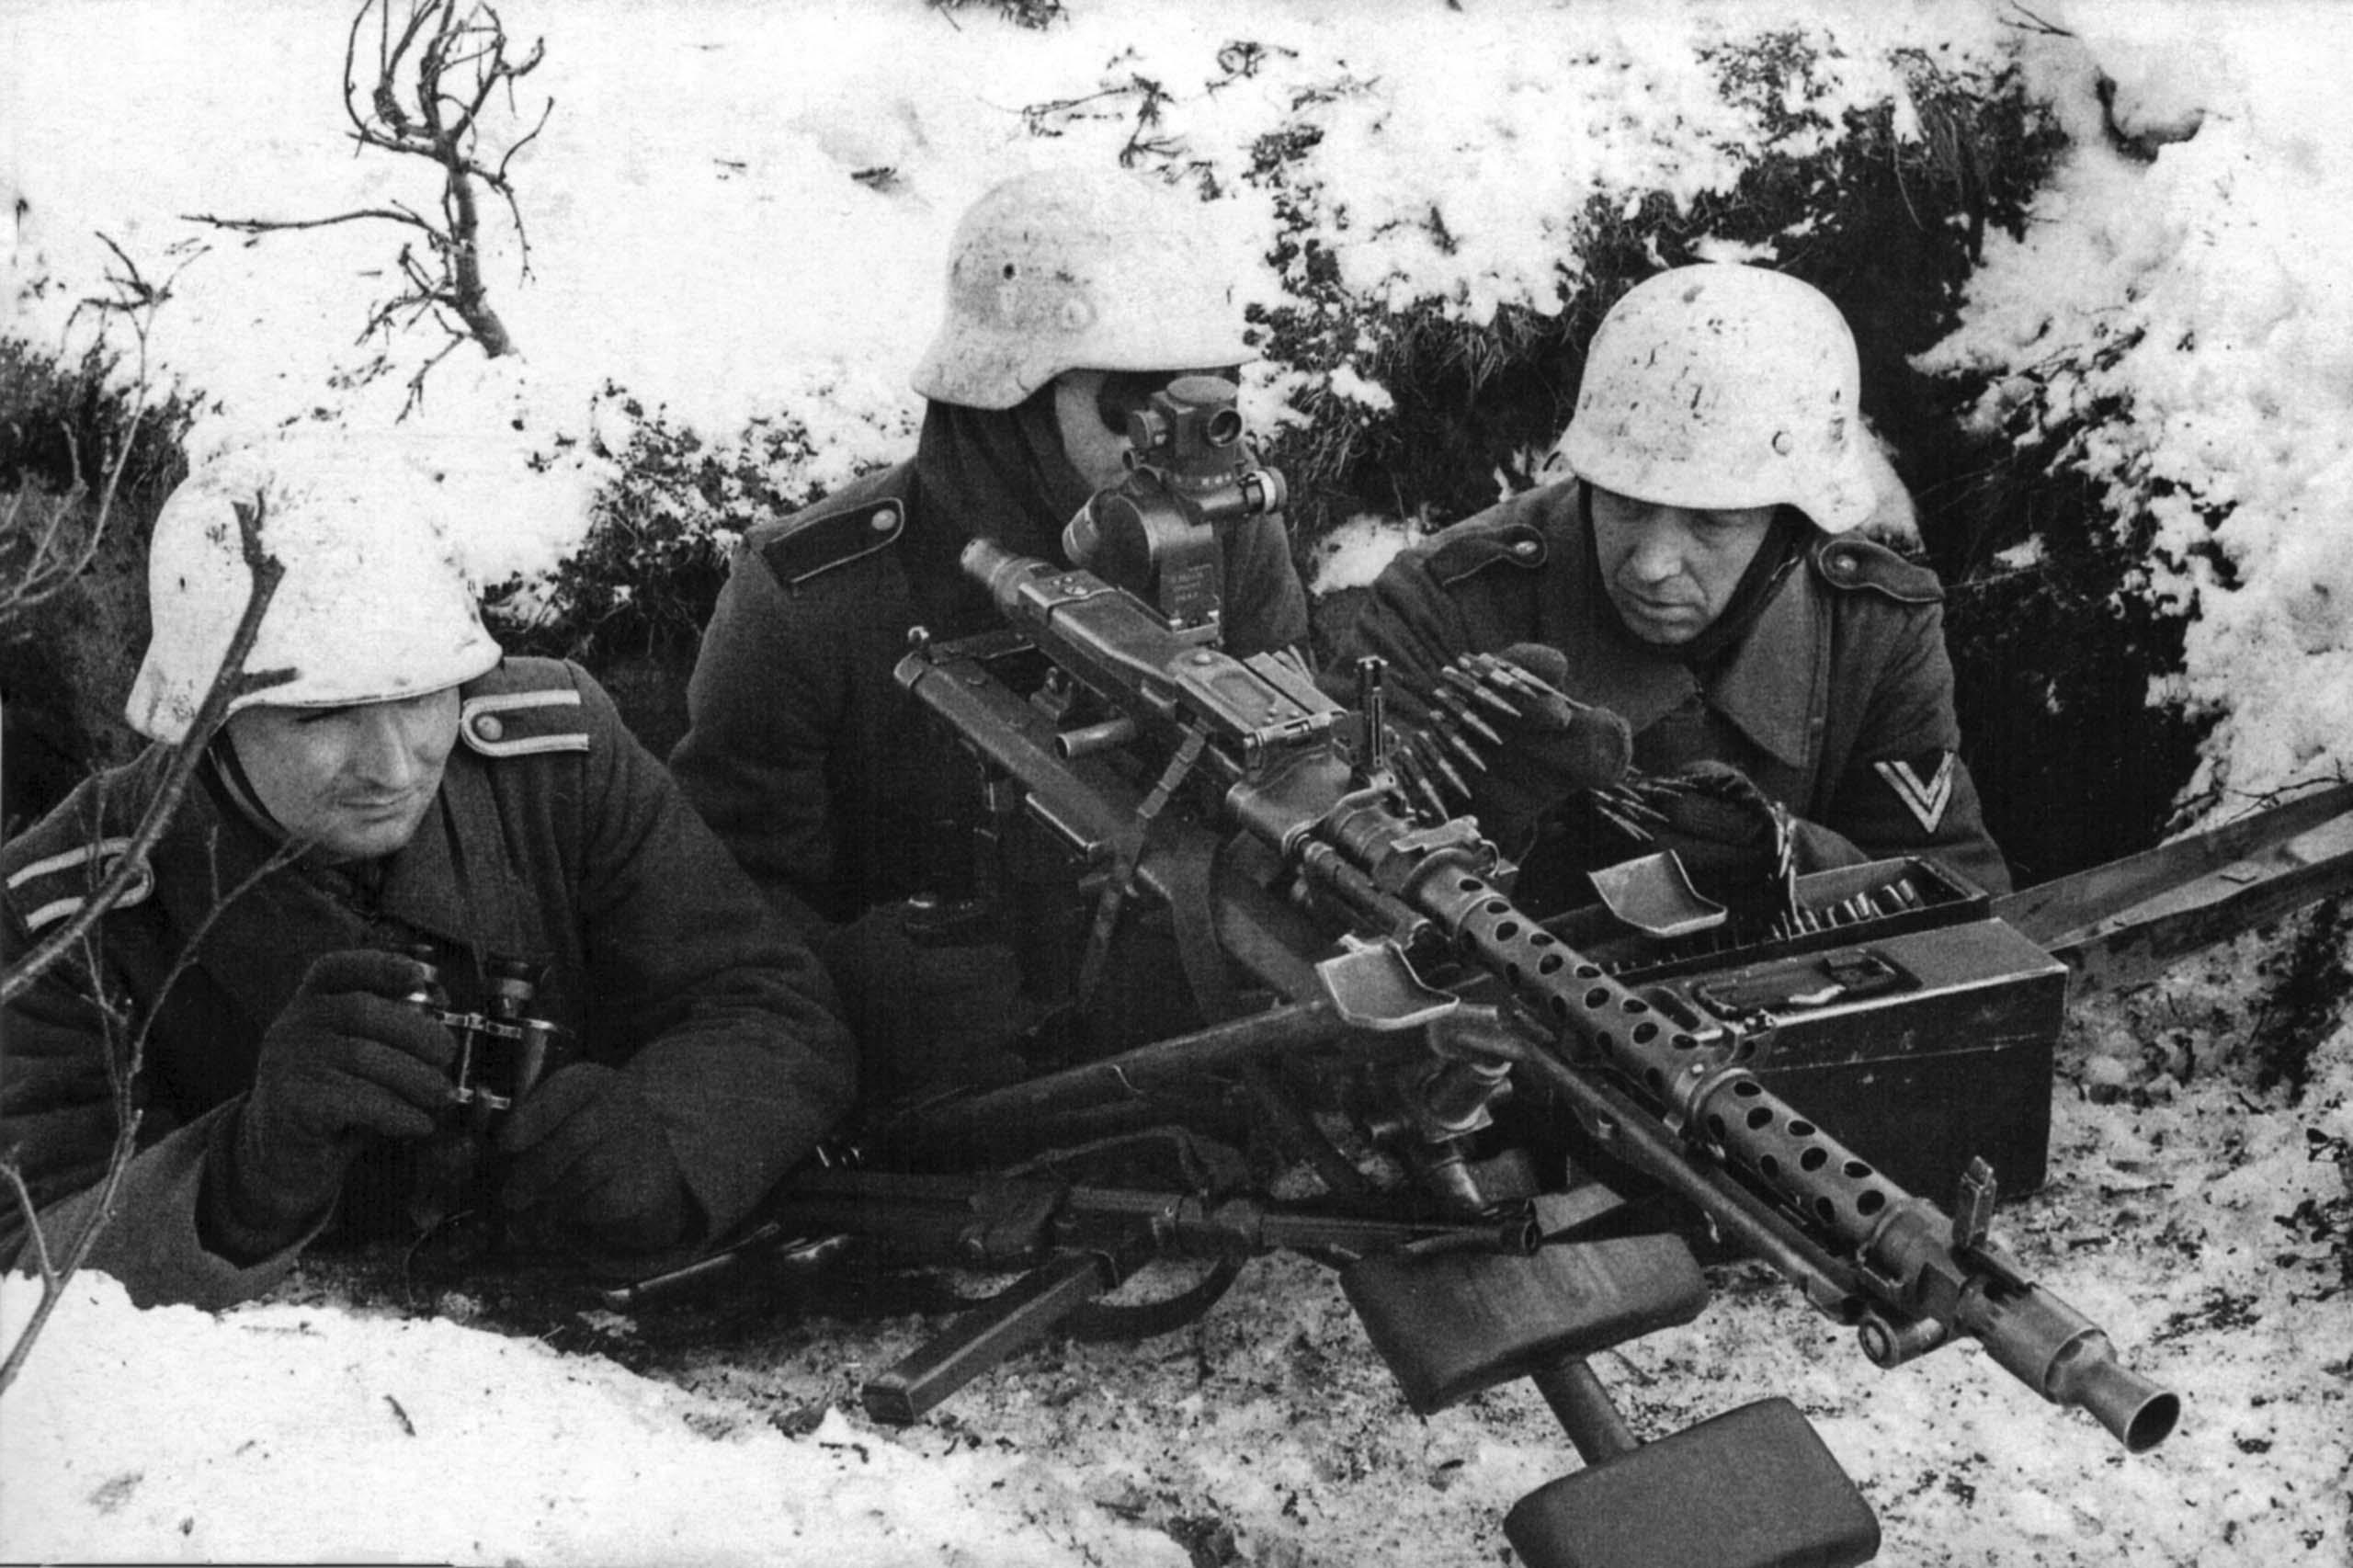 MG 34 team